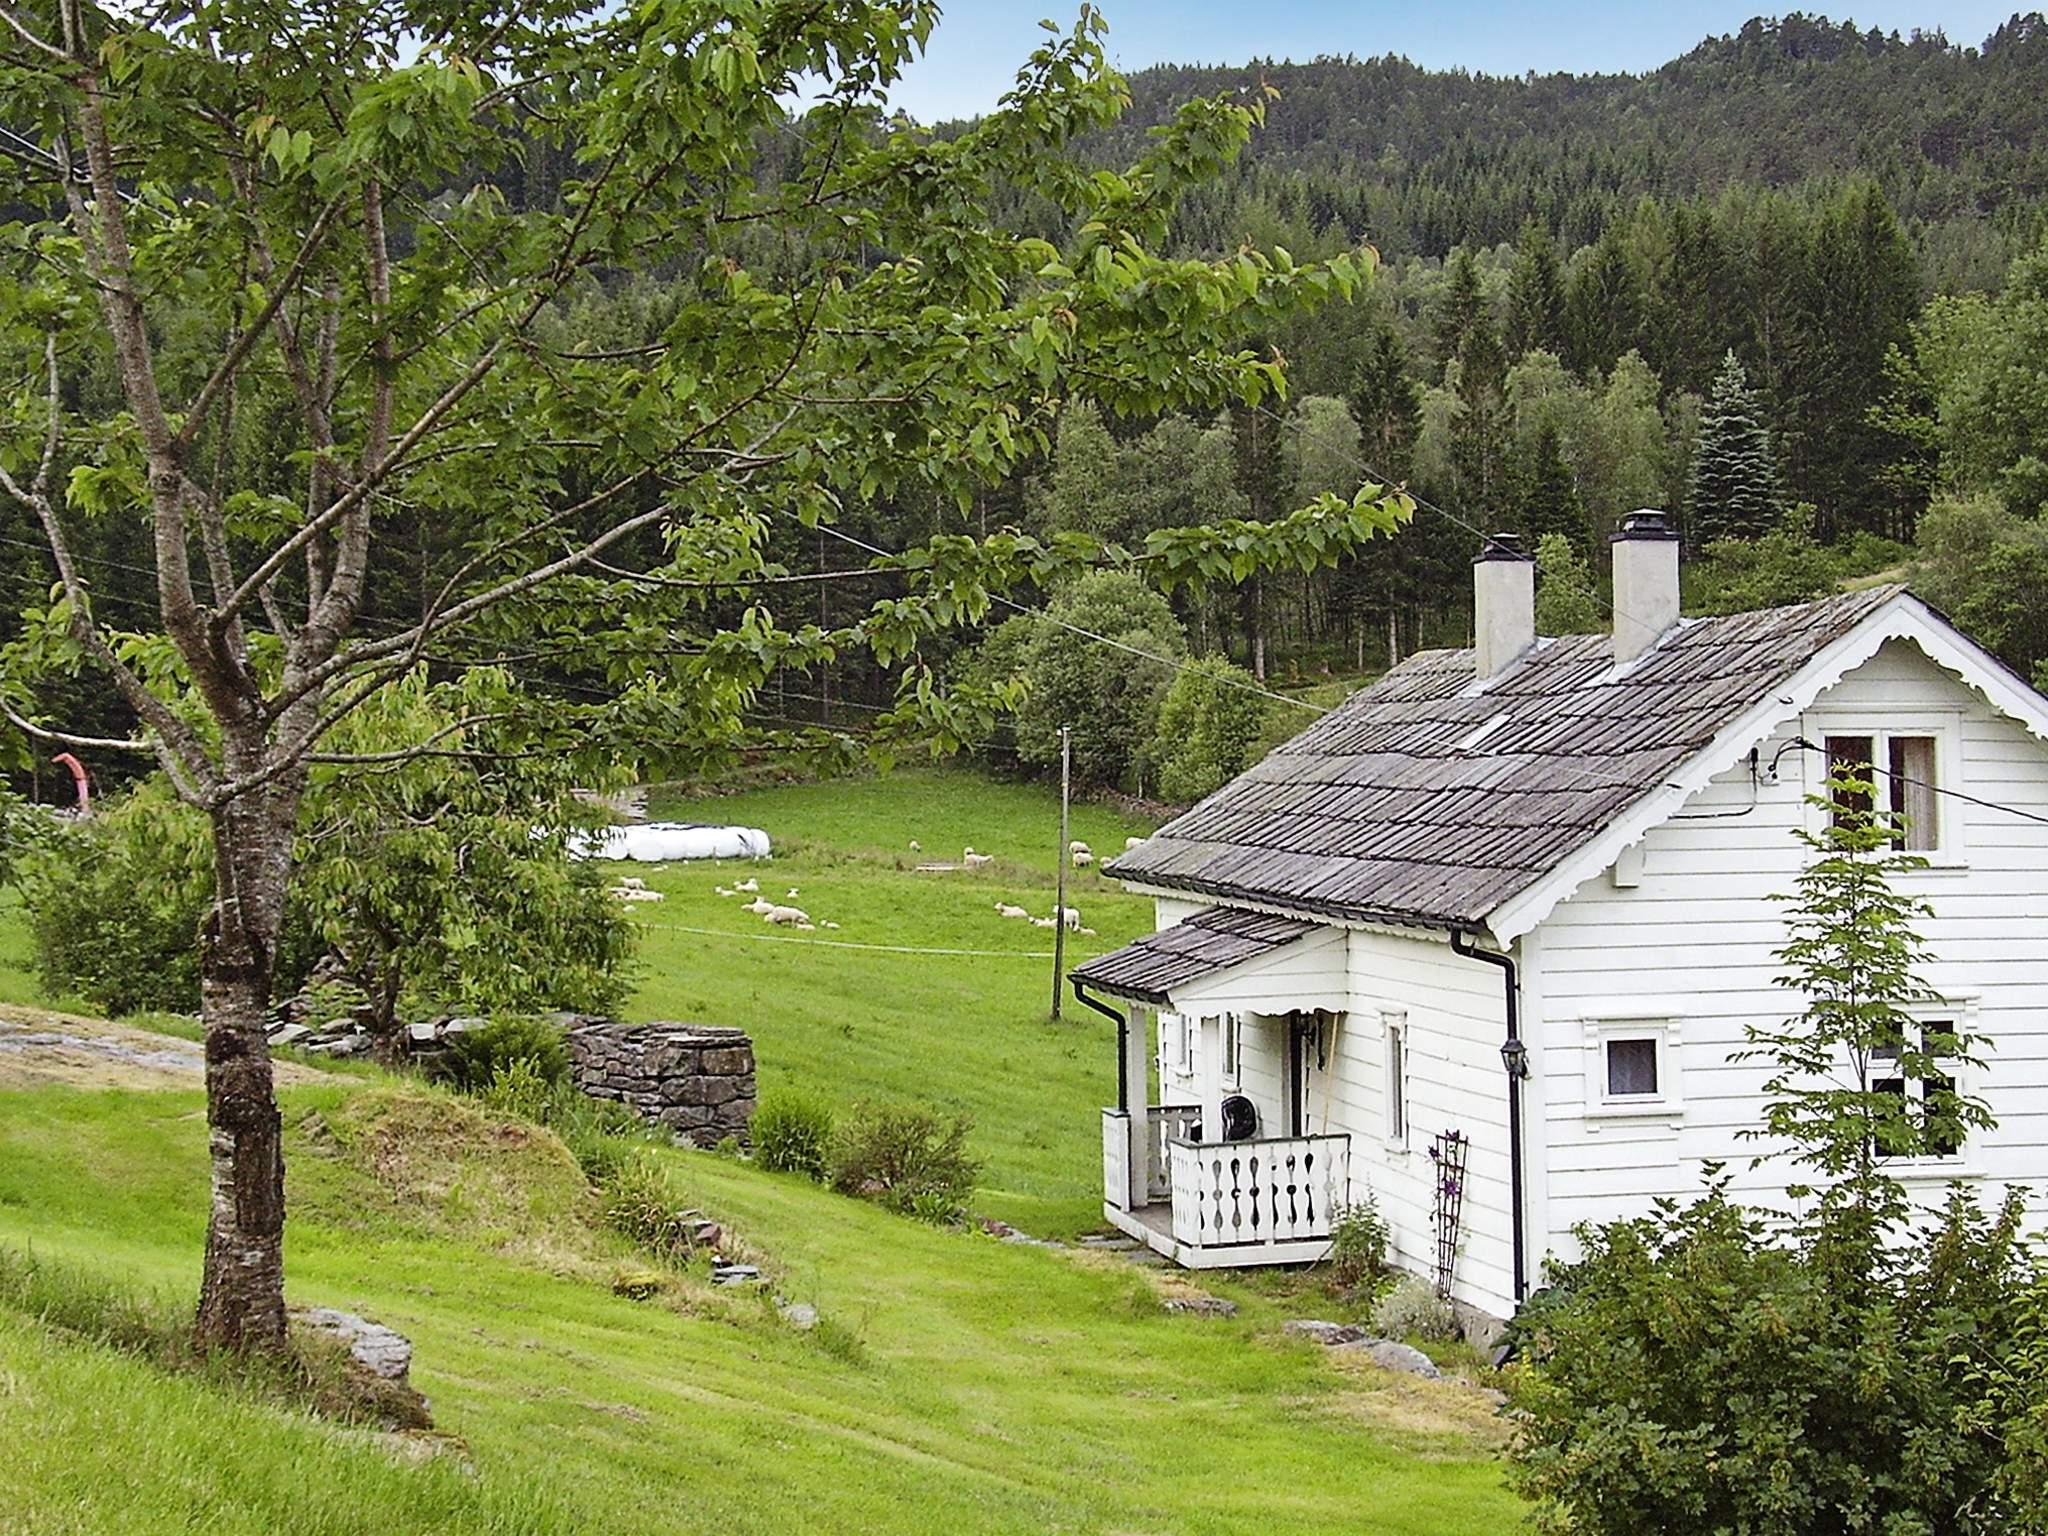 Ferienhaus Etne (83639), Etne, Hordaland - Hardangerfjord, Westnorwegen, Norwegen, Bild 17